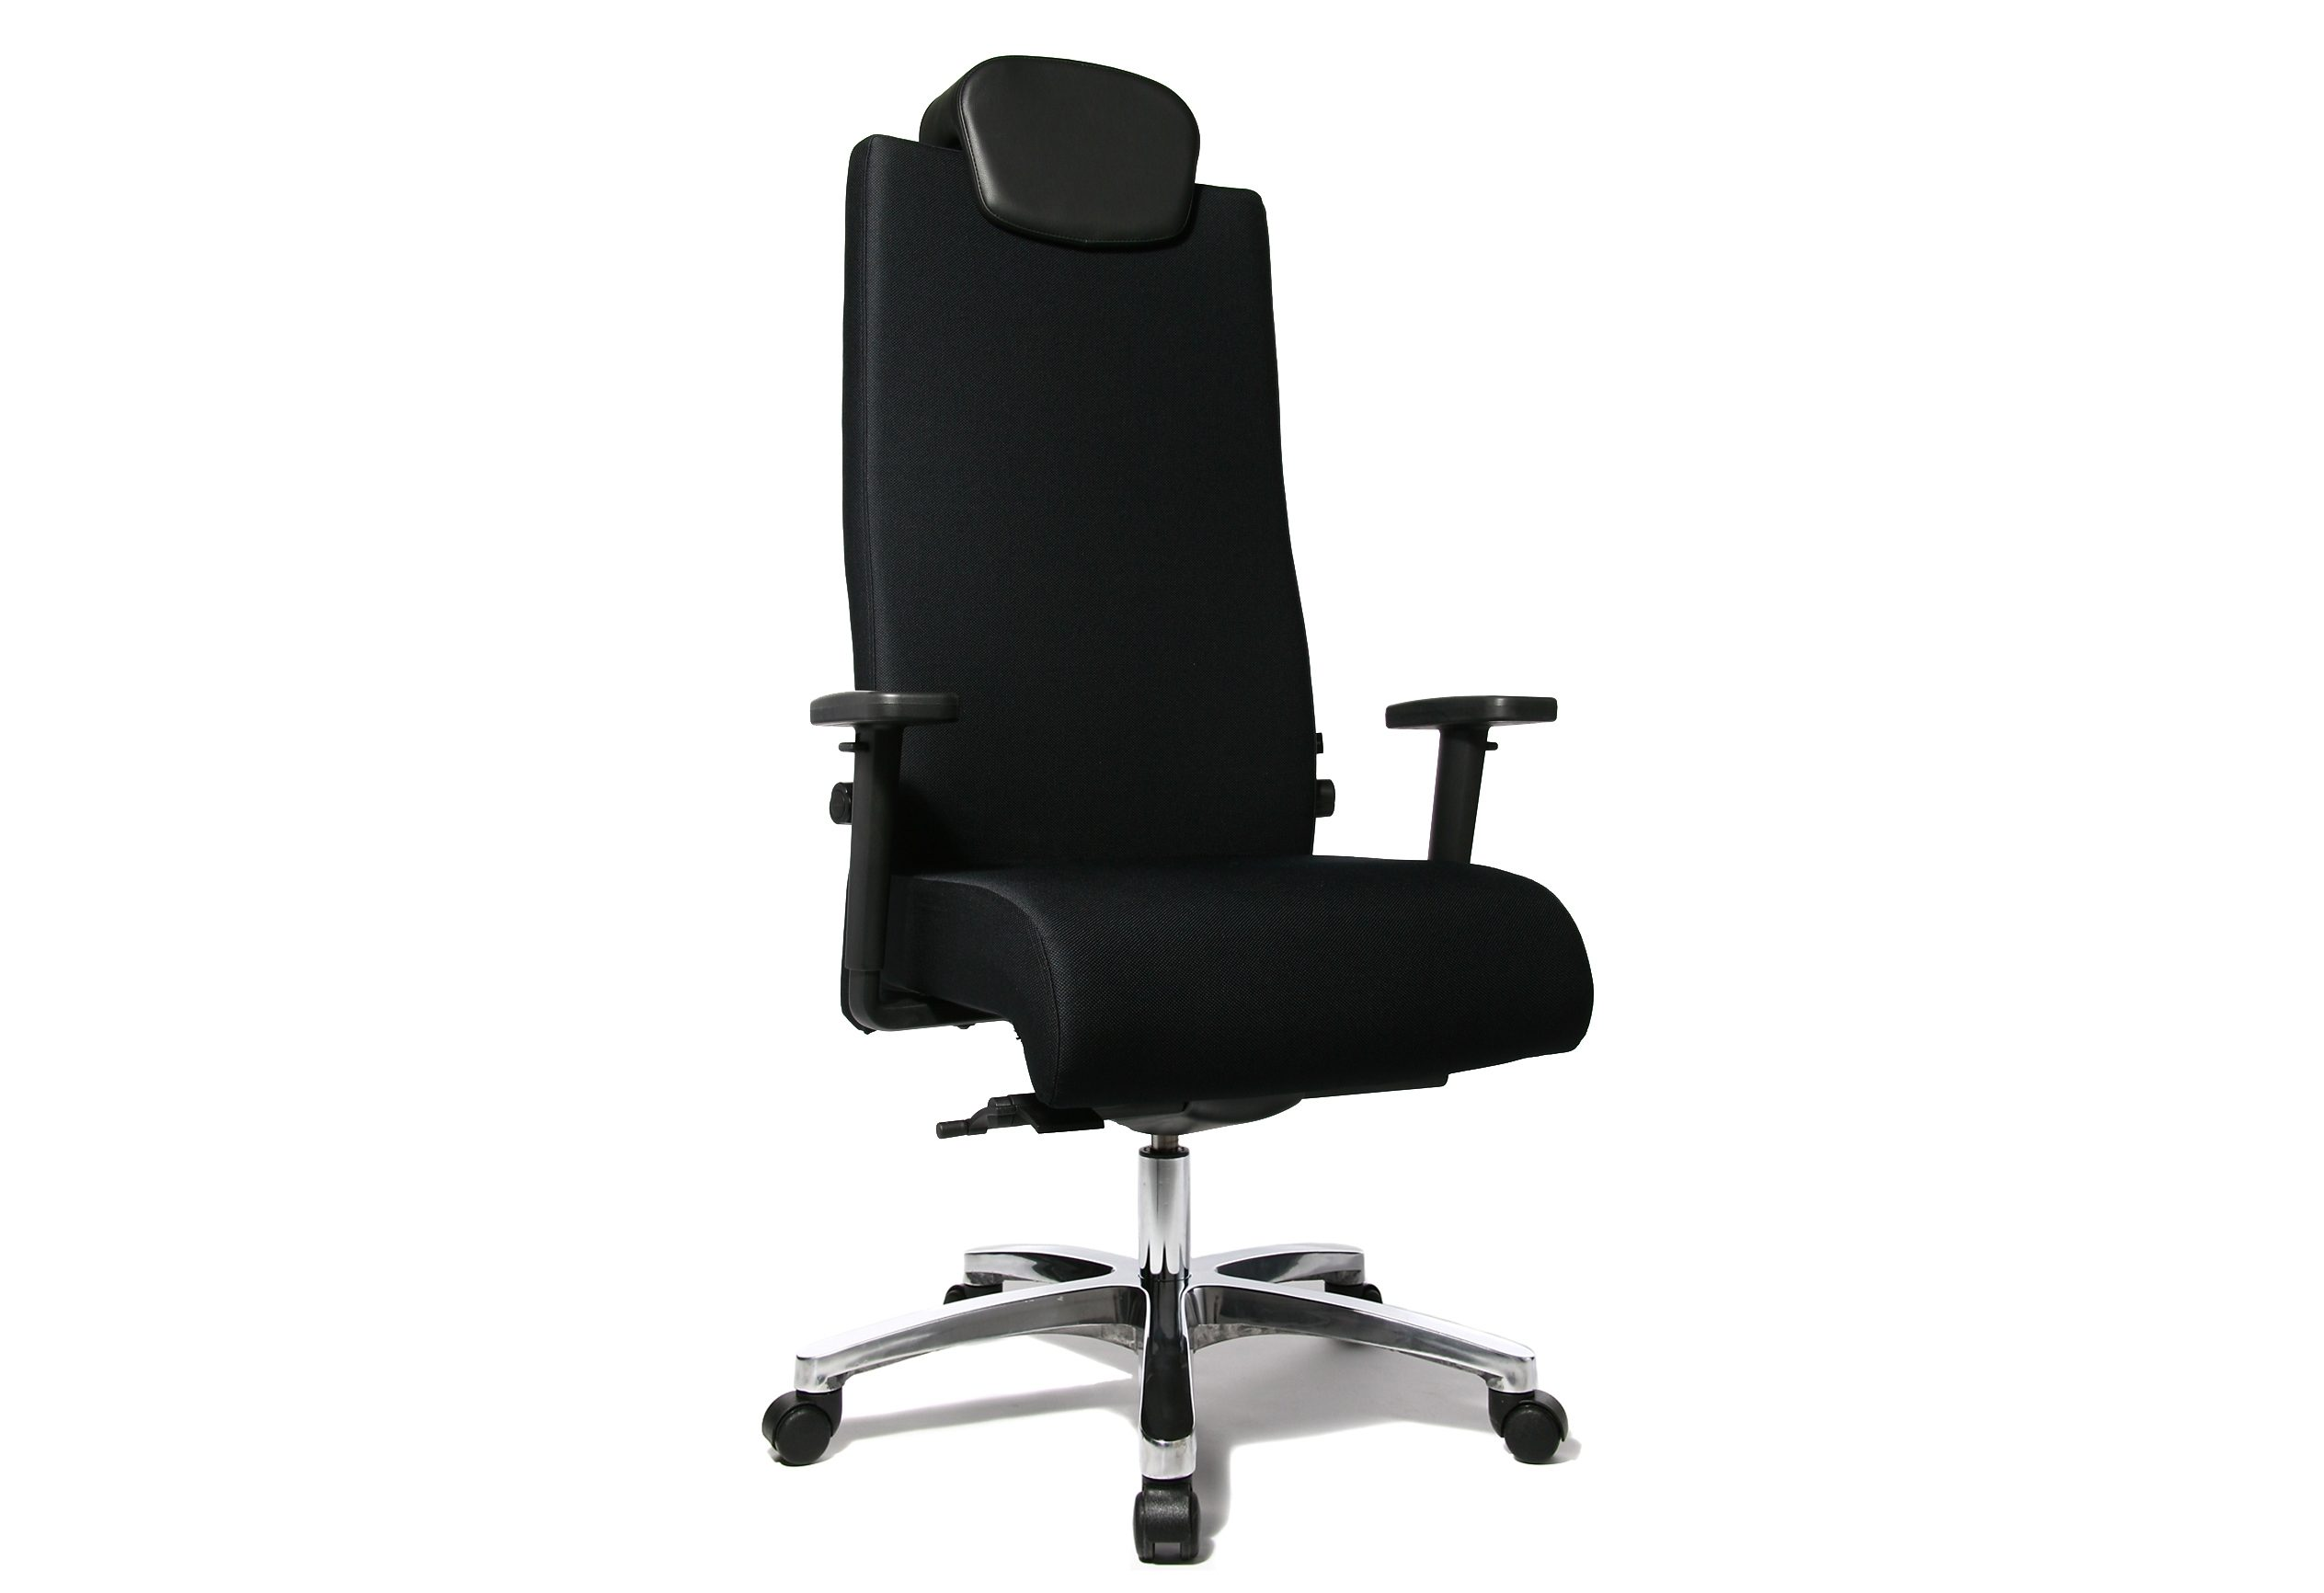 Topstar Bürostuhl, bis 150 kg belastbar, in 2 Farben